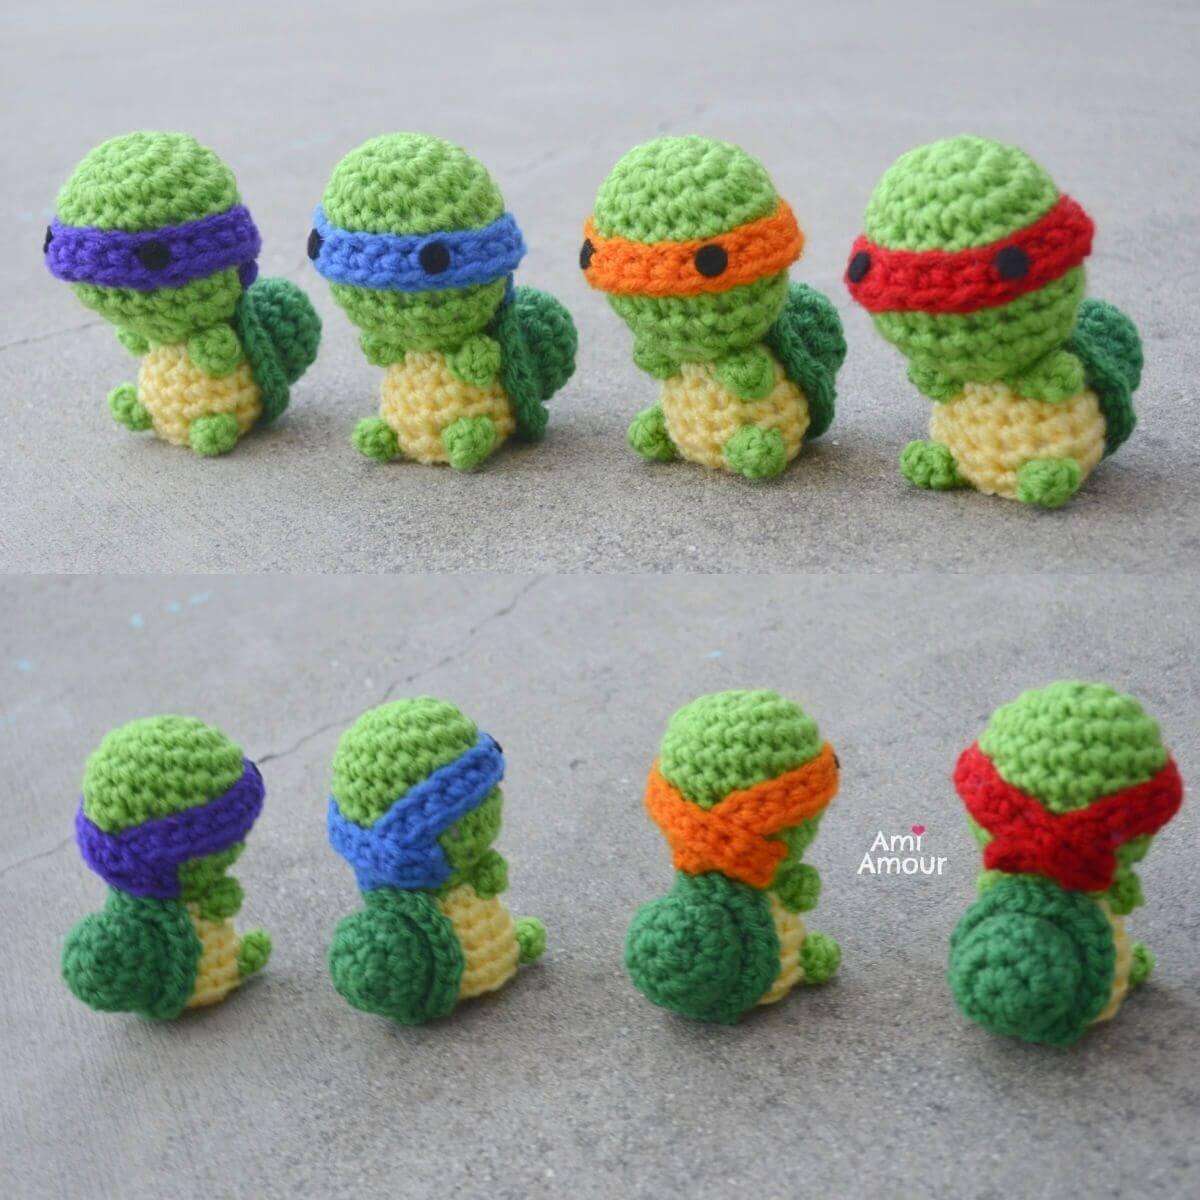 Crochet Ninja Turtles - Front and Back